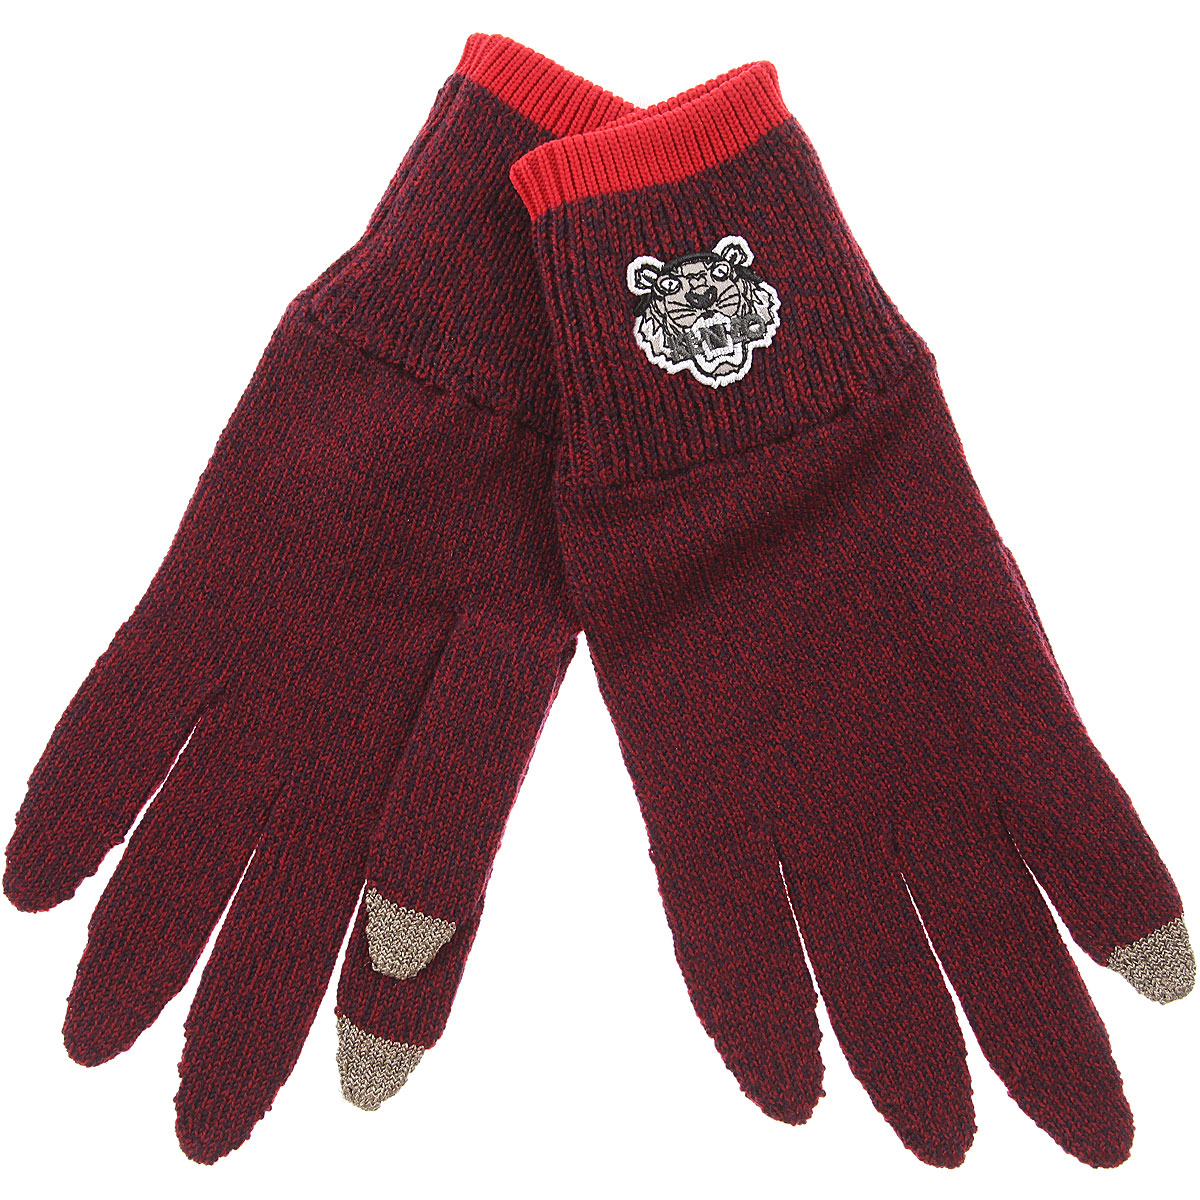 Image of Kenzo Gloves for Men, Bordeaux, Wool, 2017